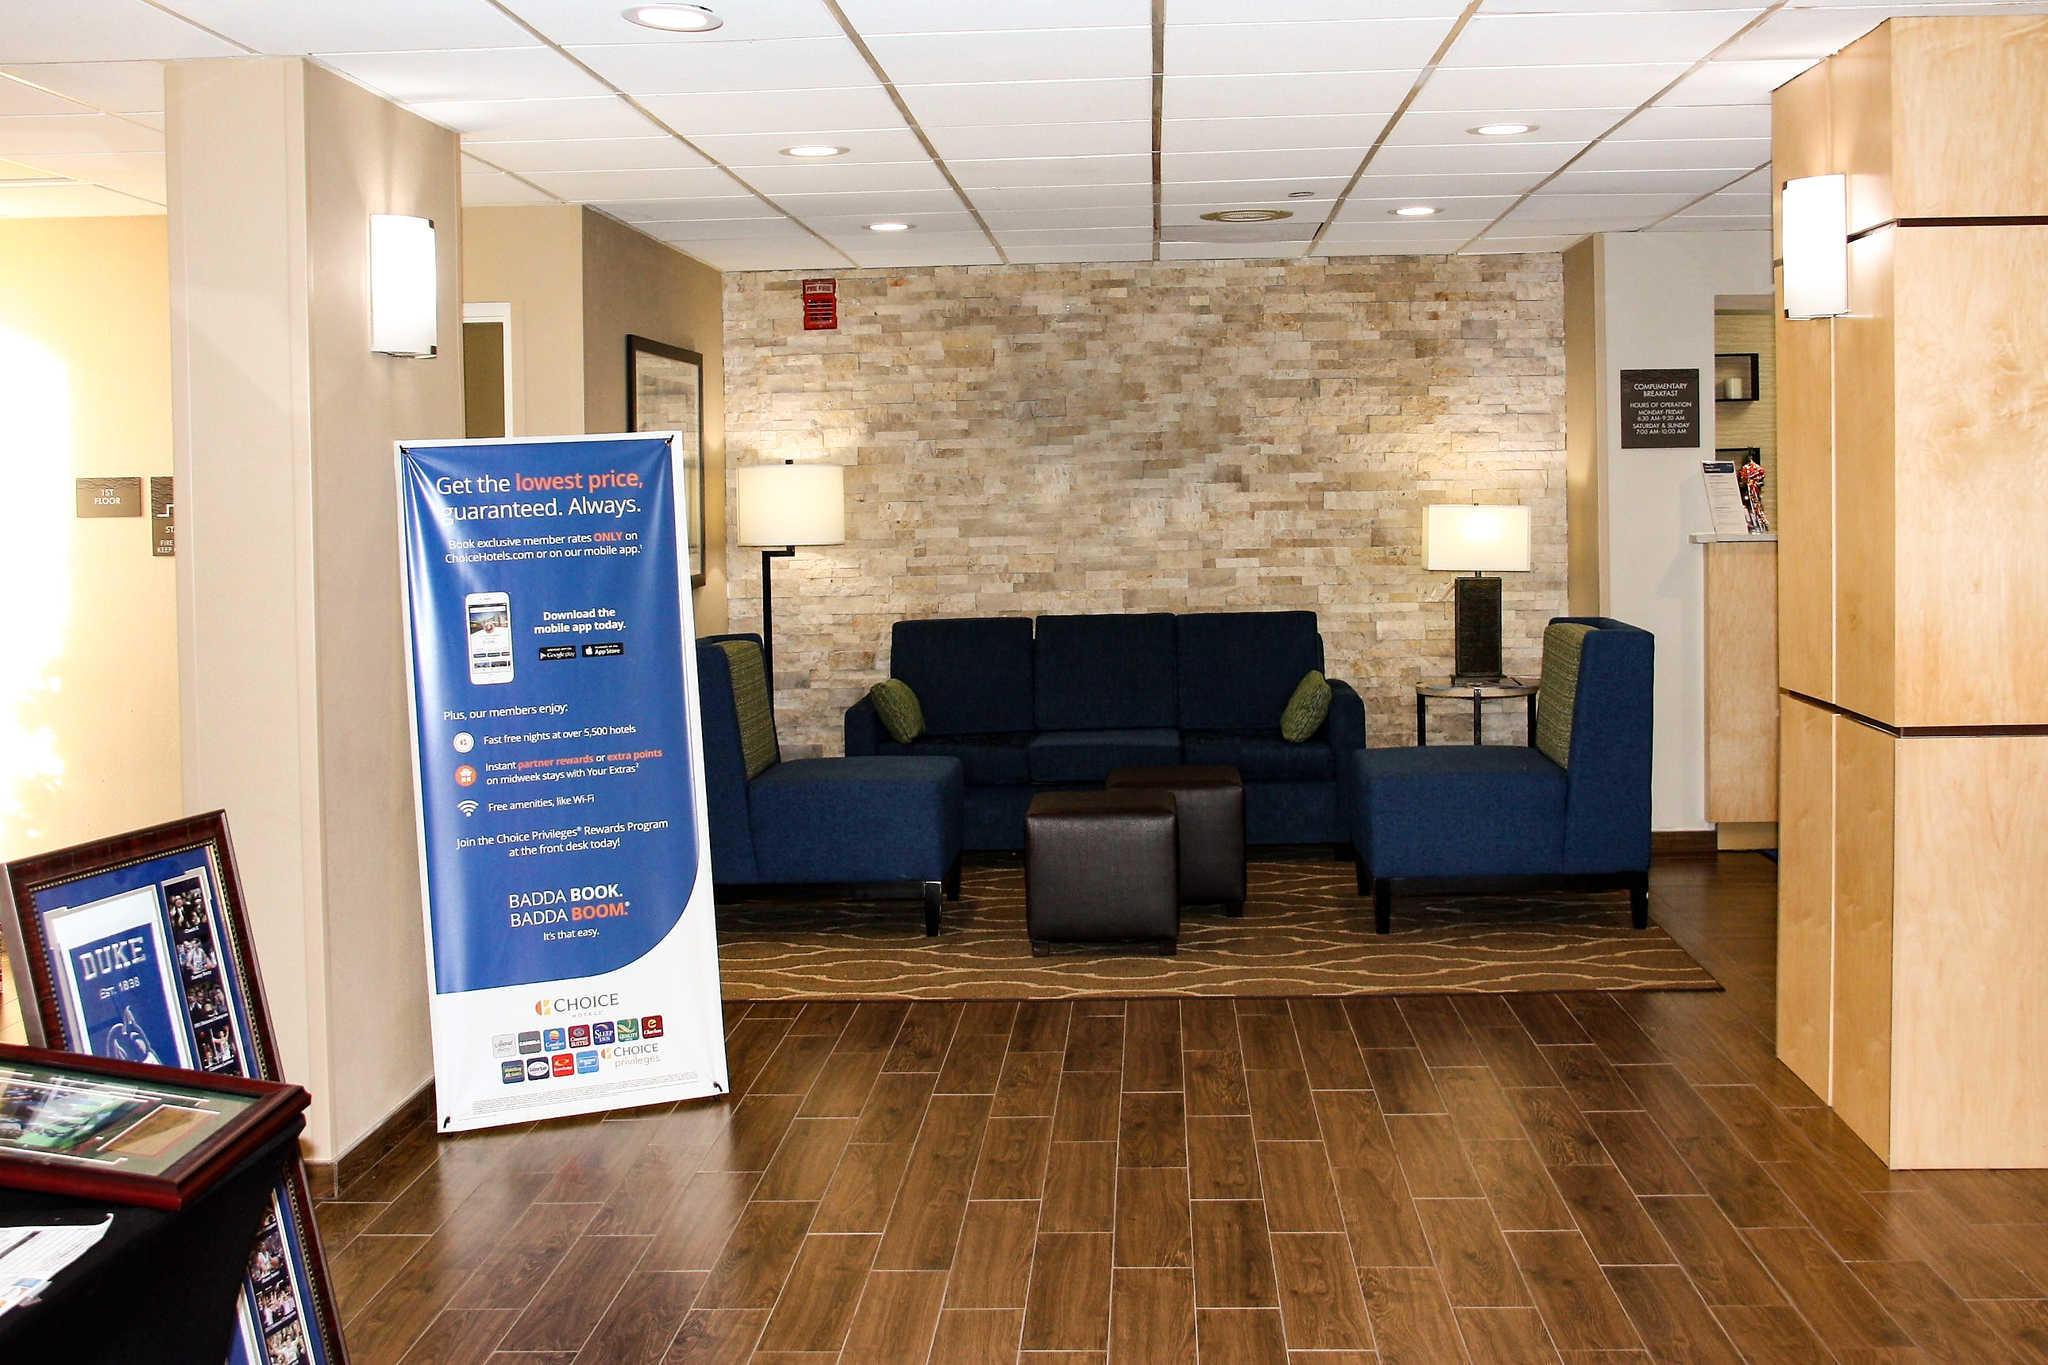 Comfort Inn & Suites Duke University-Downtown image 5